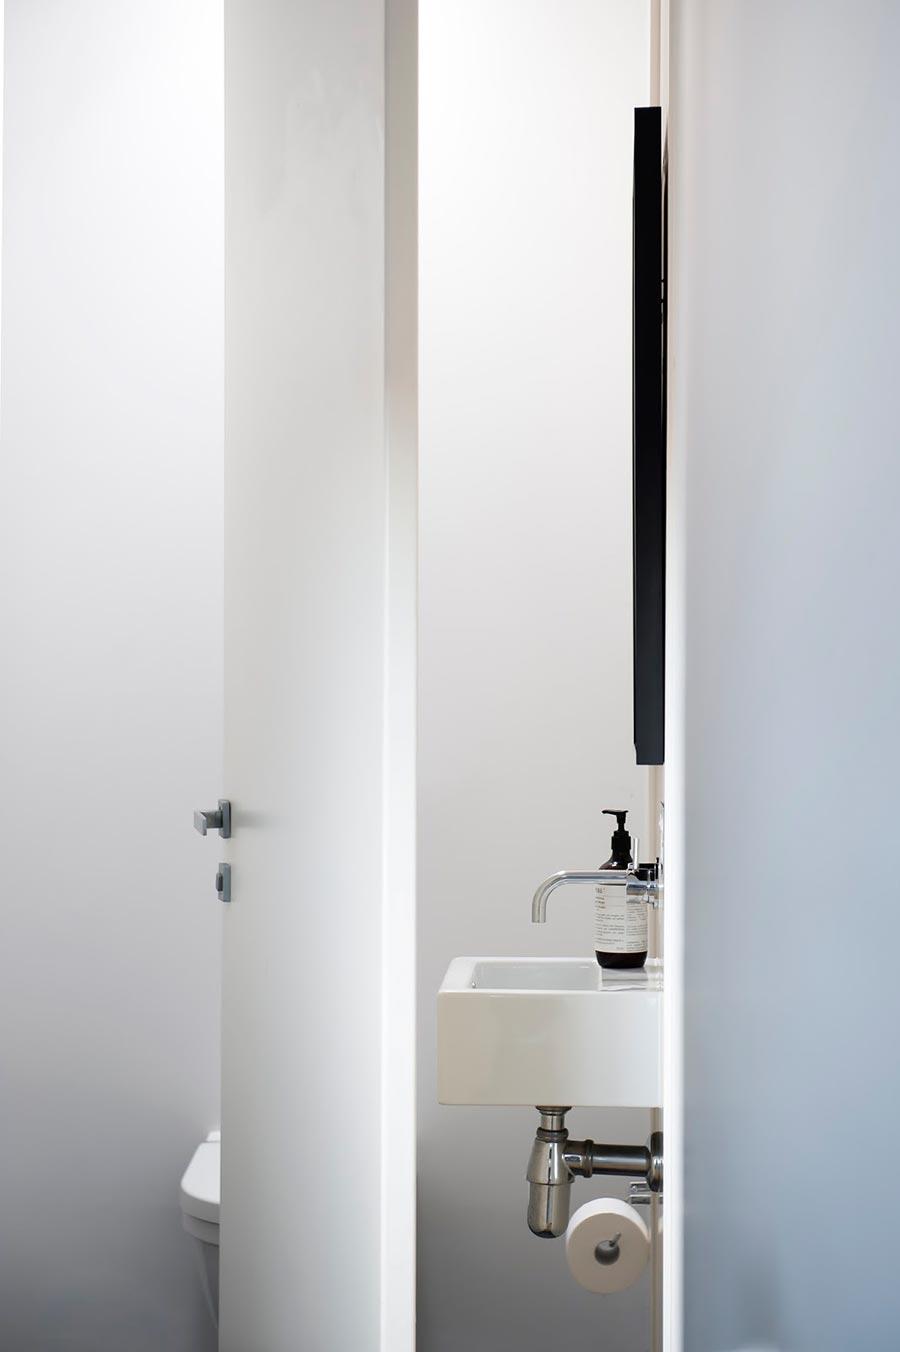 Award-winning monochromatic Bathroom by Minosa Design on Monochromatic Bathroom Ideas  id=49381